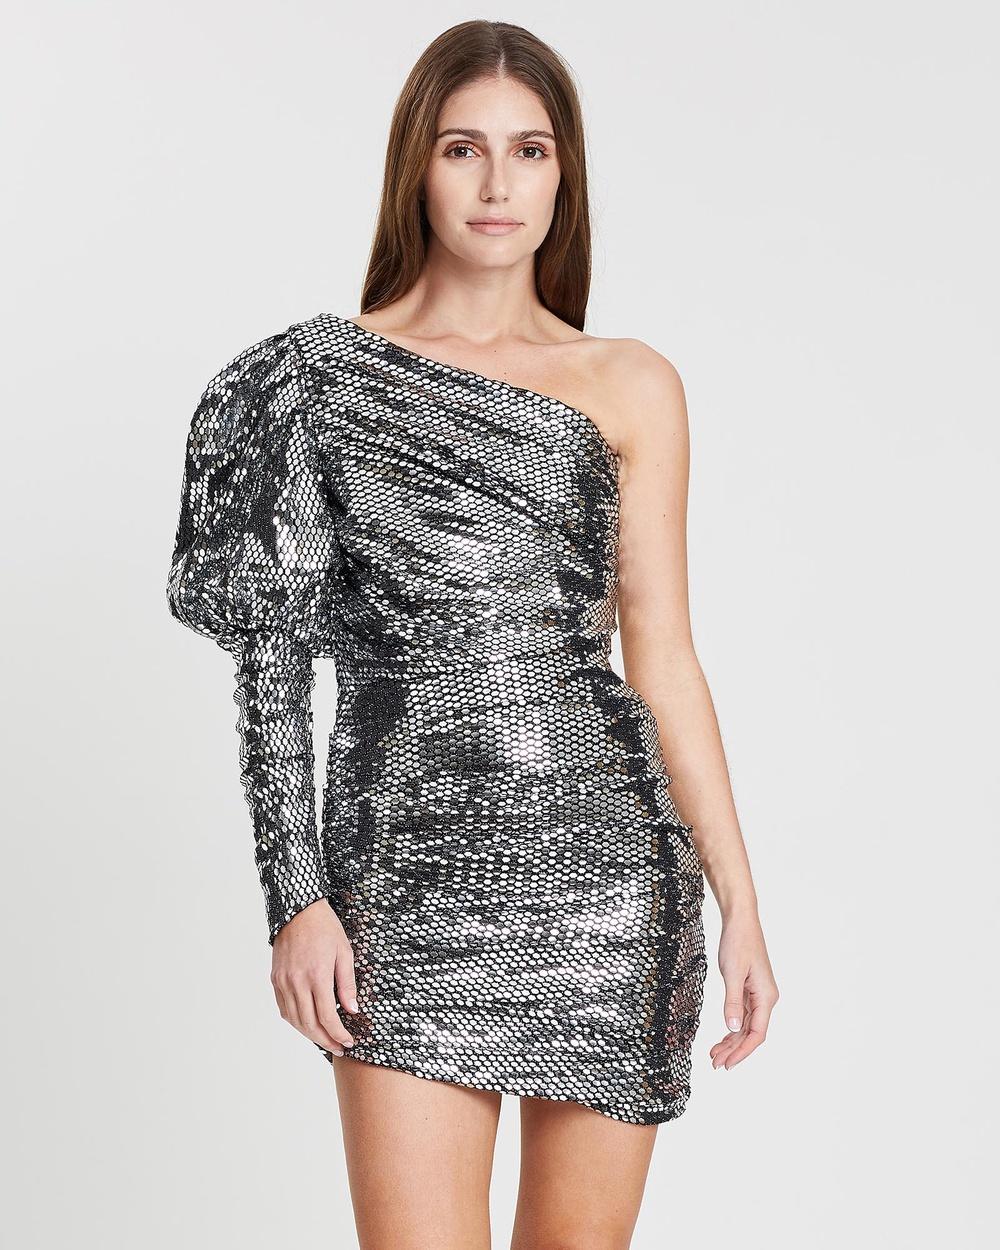 Eliya The Label Silver Monarch Dress